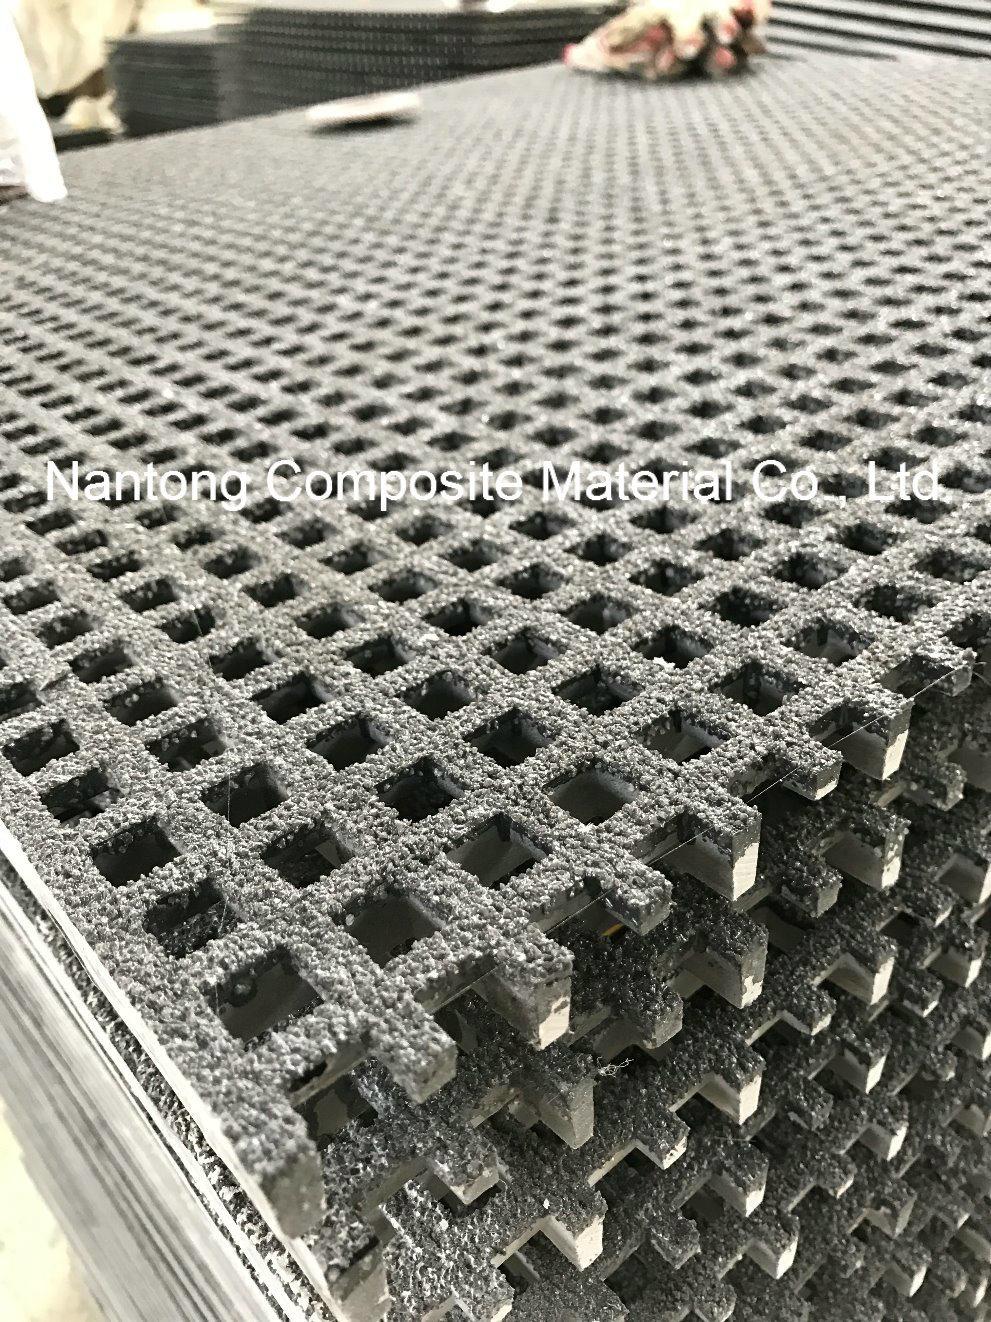 Mini Mesh Grating, FRP, for Platforms, Walkways, Flooring & Covers